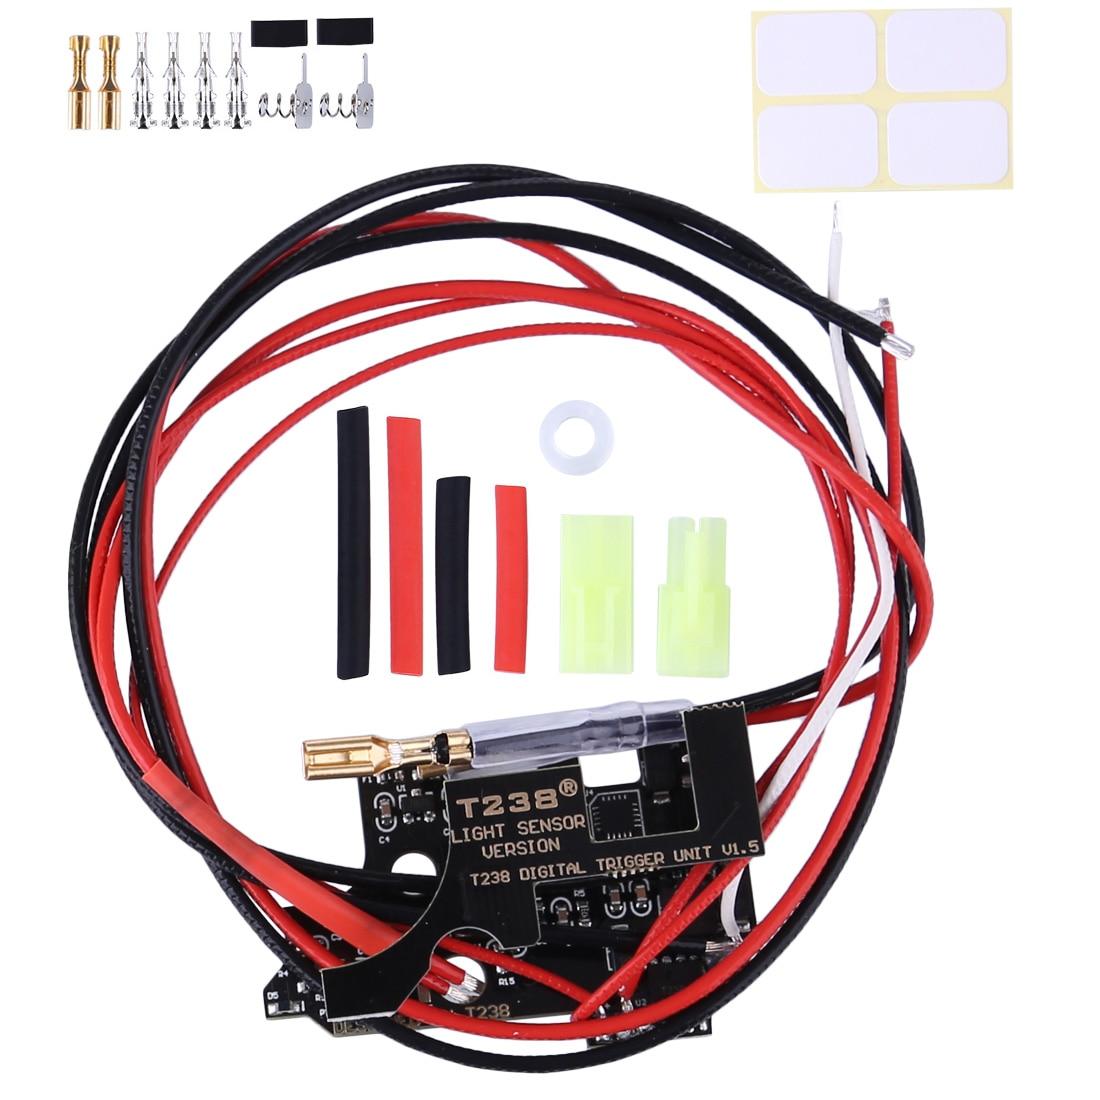 Módulo electrónico de Control de fuego T238, programable, MOSFET, para caja de cambios XWE M4 / JM Gen.9 / FB / Kublai / Jingji / JQ No.2